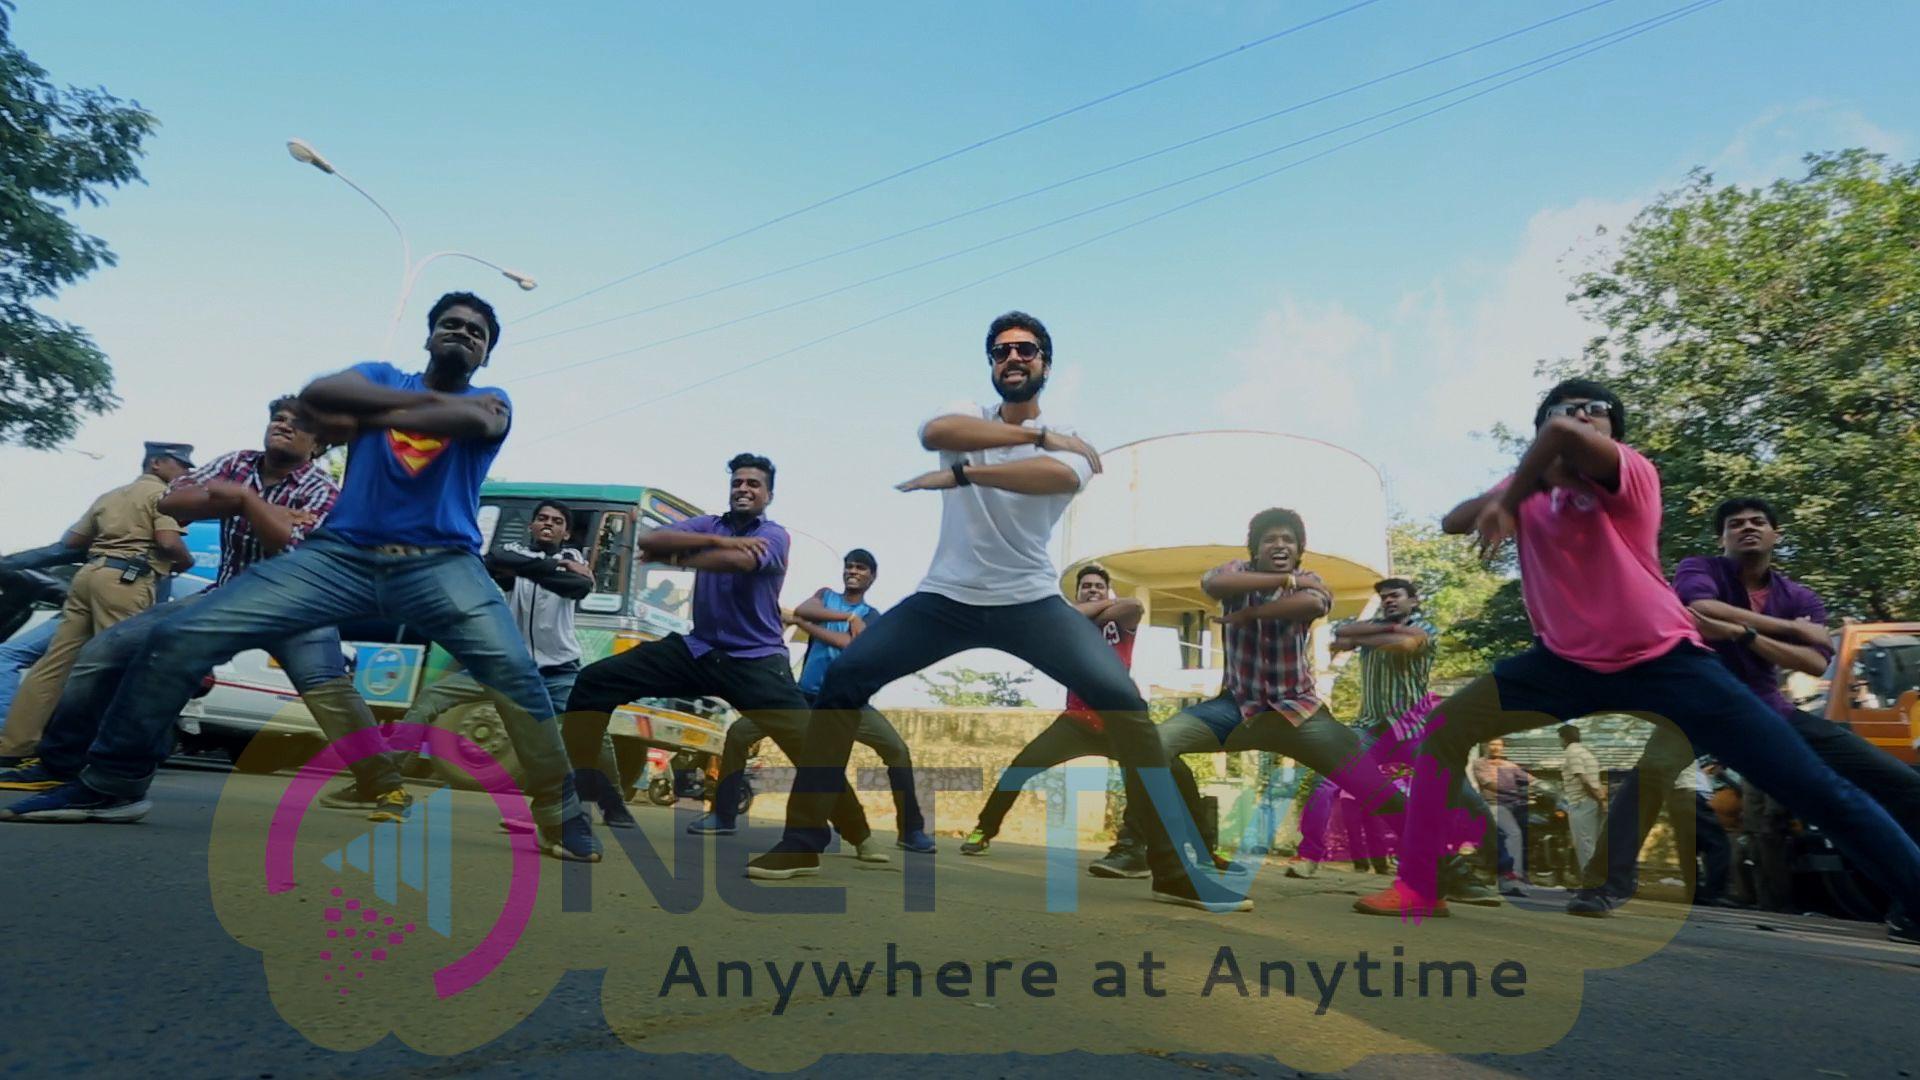 From The Desk Of Director & Actor Radhakrishnan Parthiban Stills